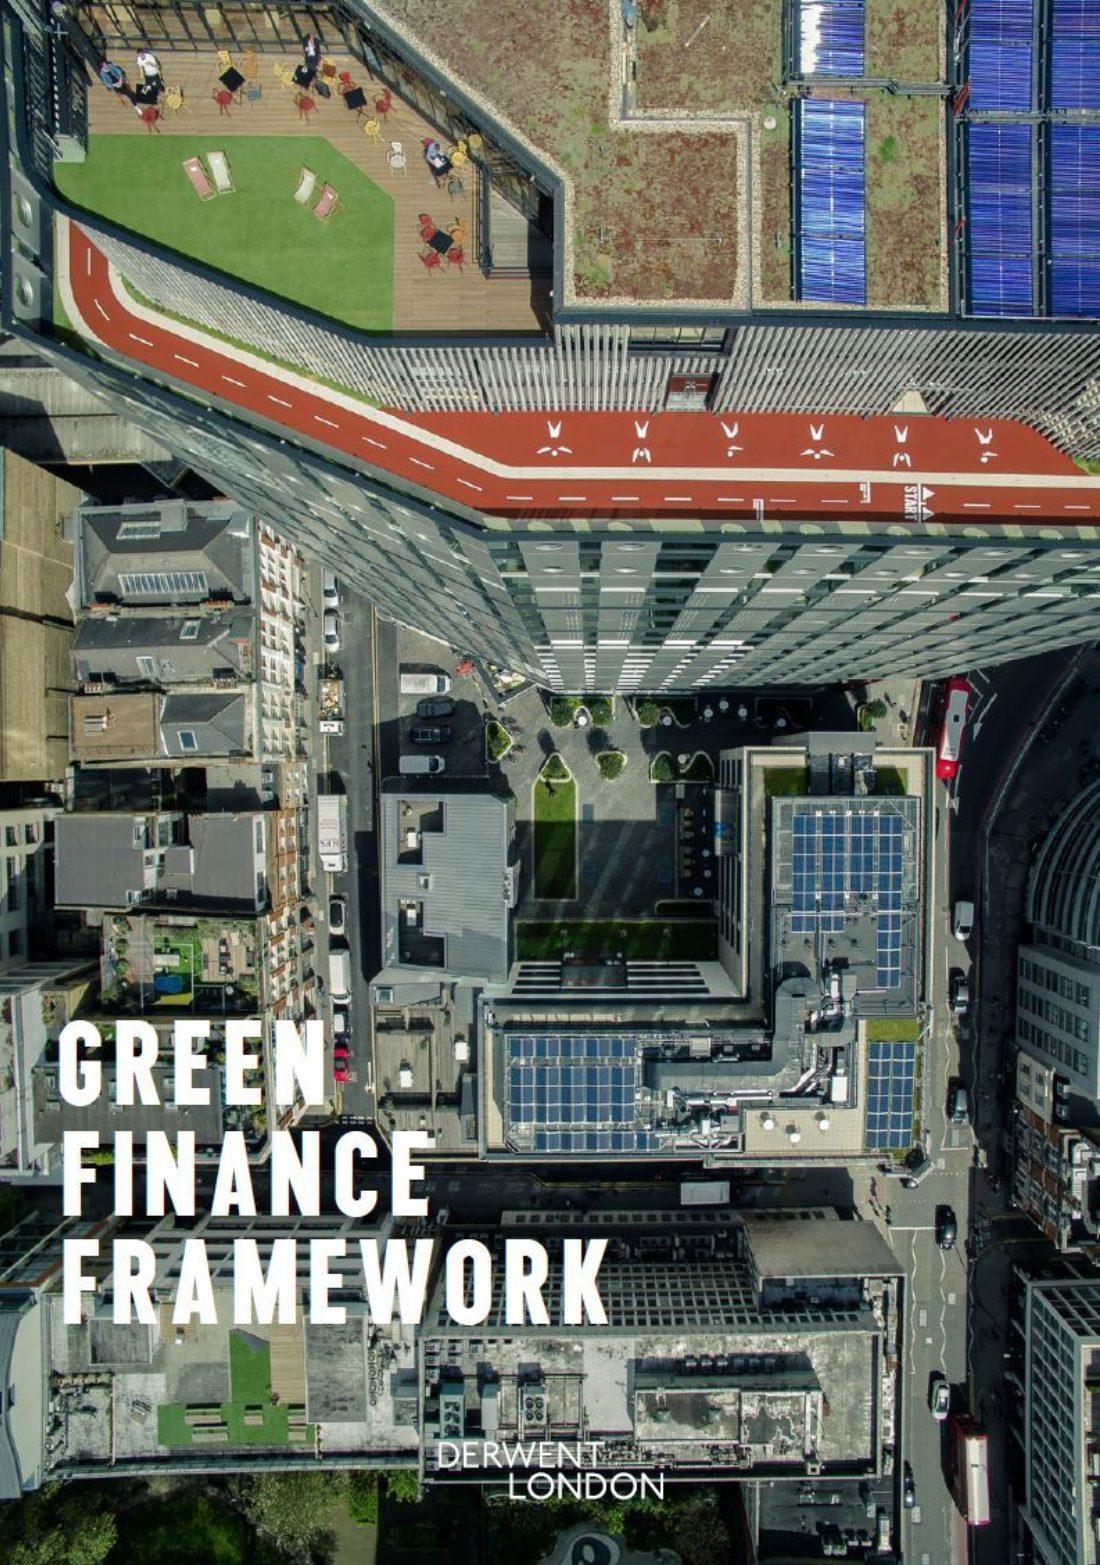 Green Finance image